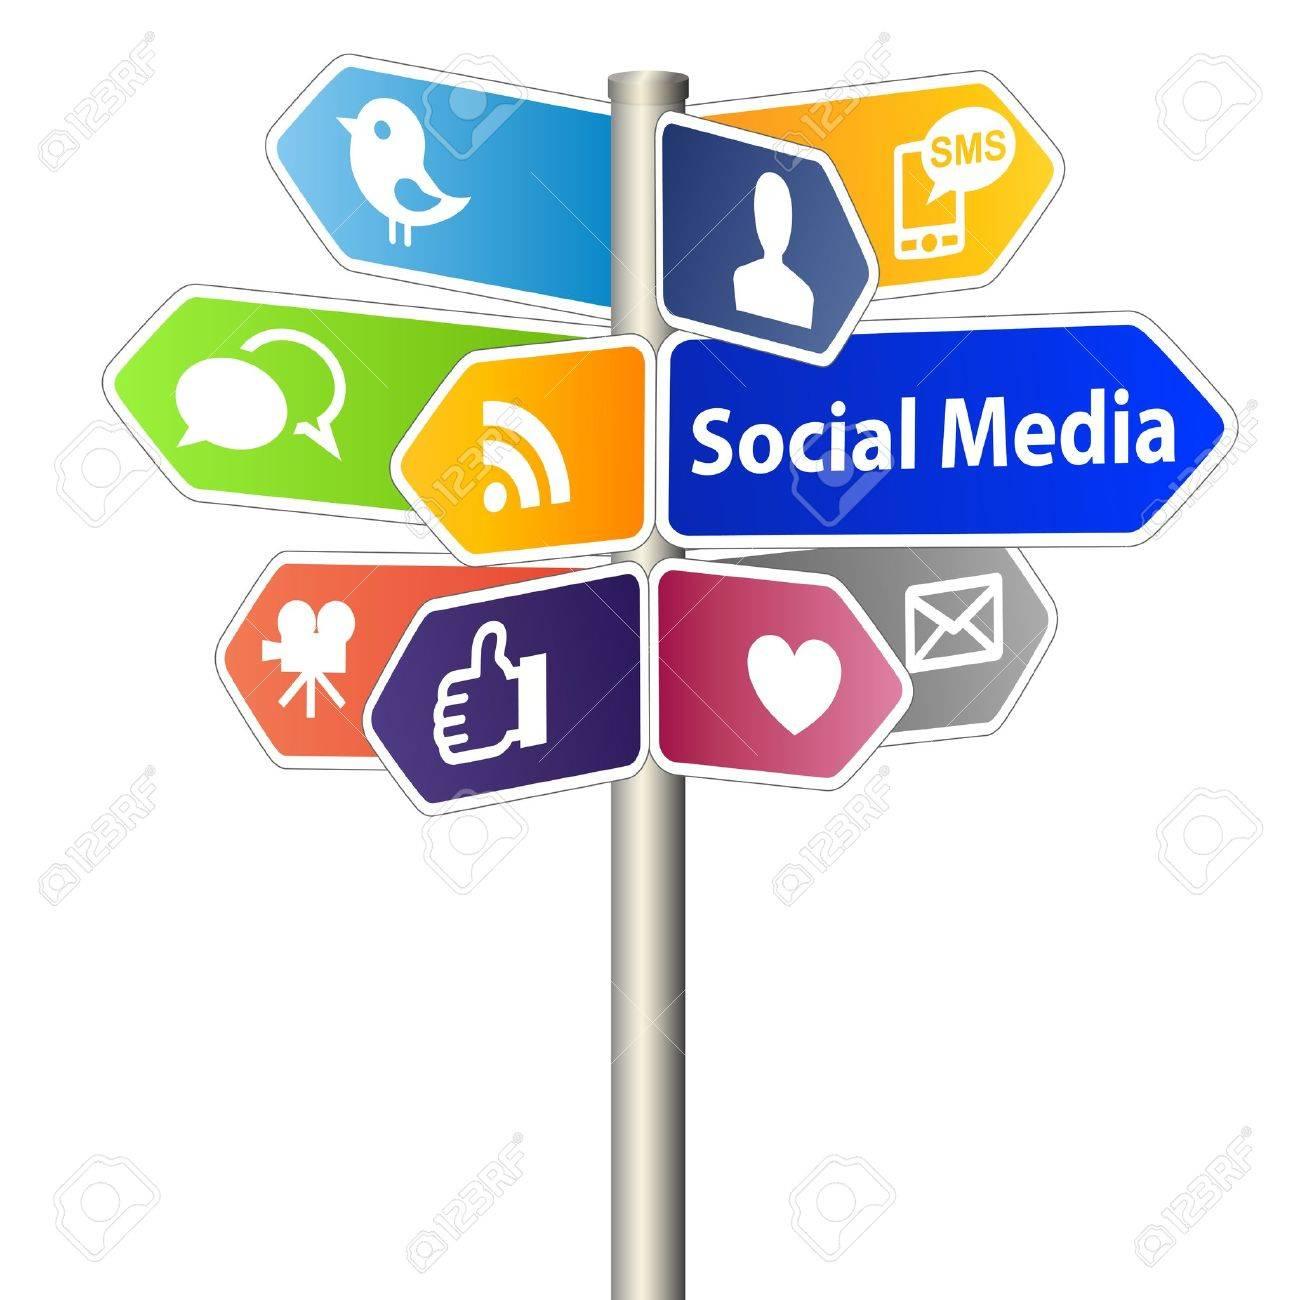 Social Media Sign Stock Photo - 11838001